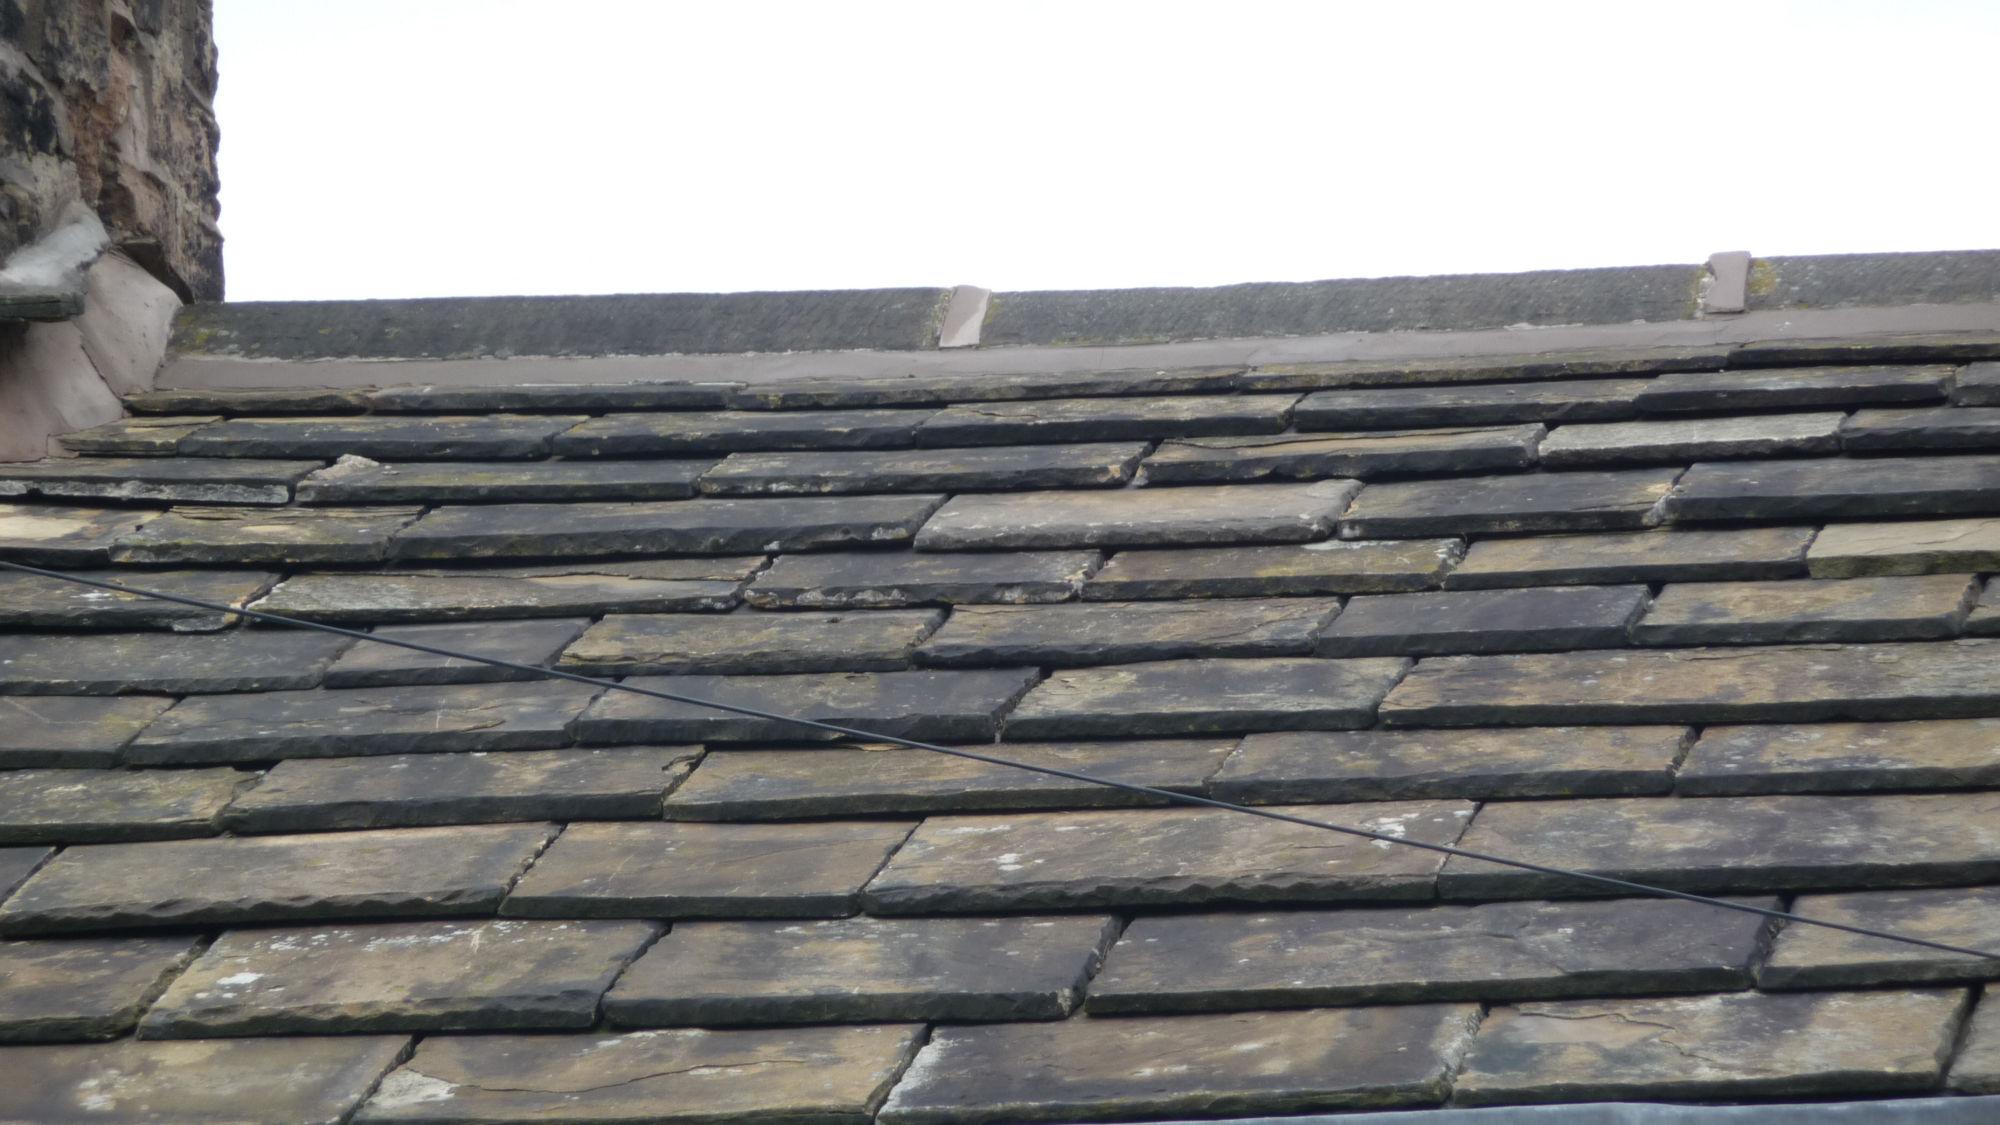 Stone roof ridge tile replacement in Accrington